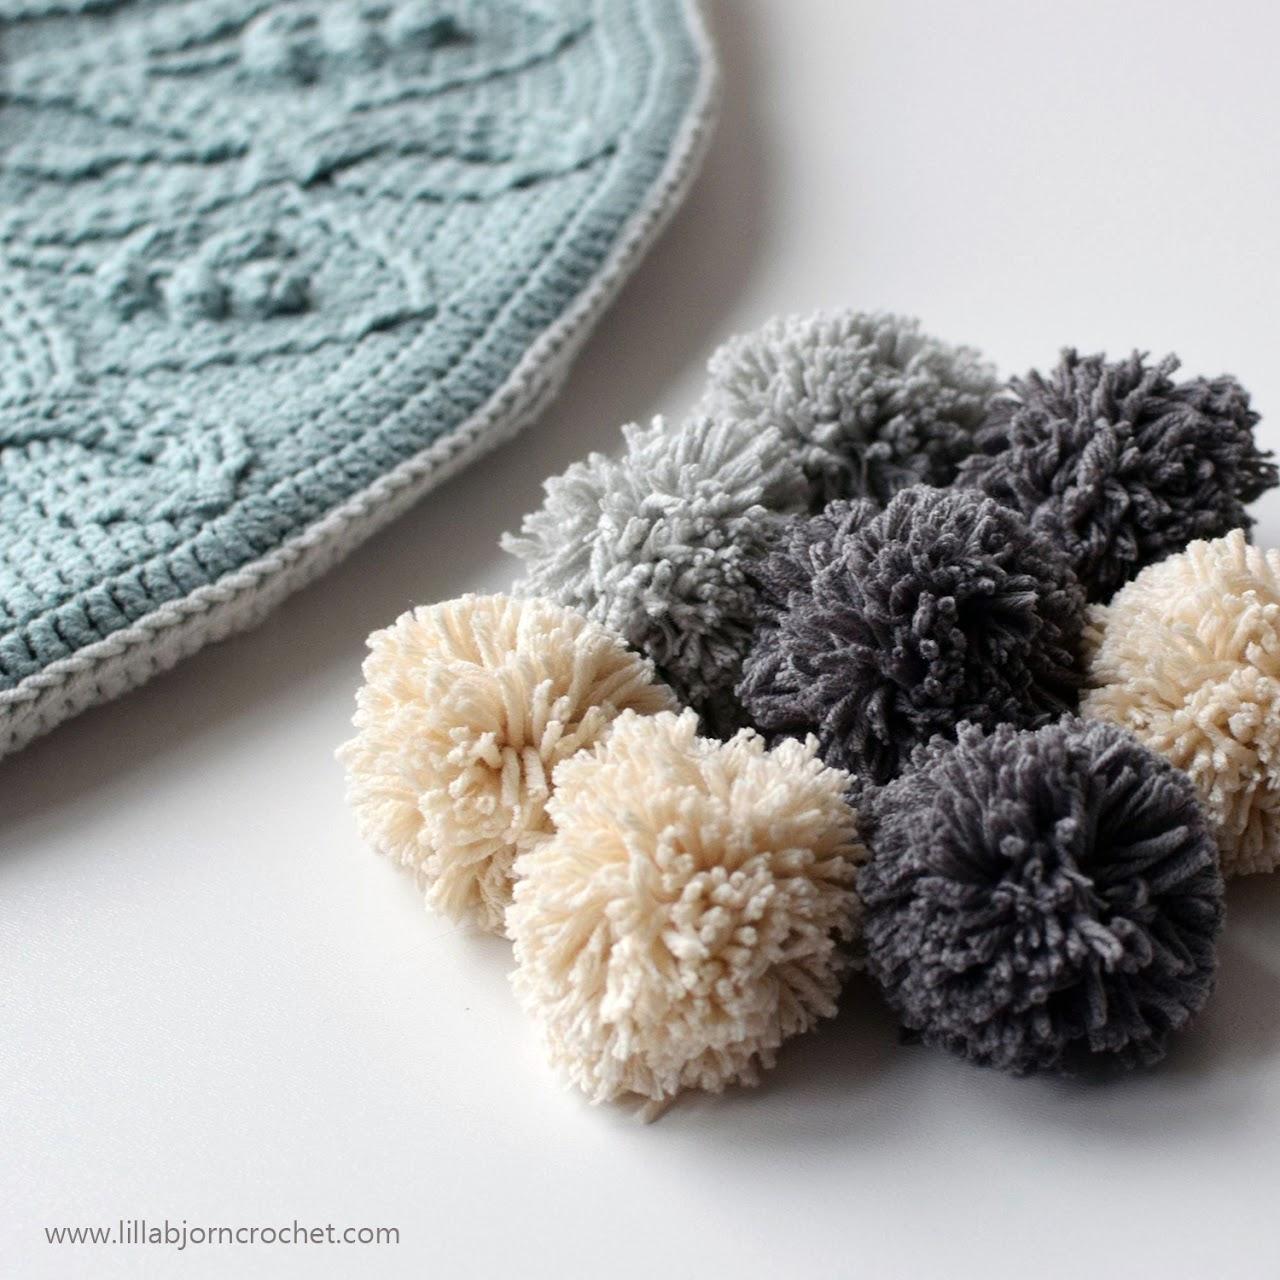 Sakura Cabled Mandala Pillow_crochet pattern by www.lillabjorncrochet.com